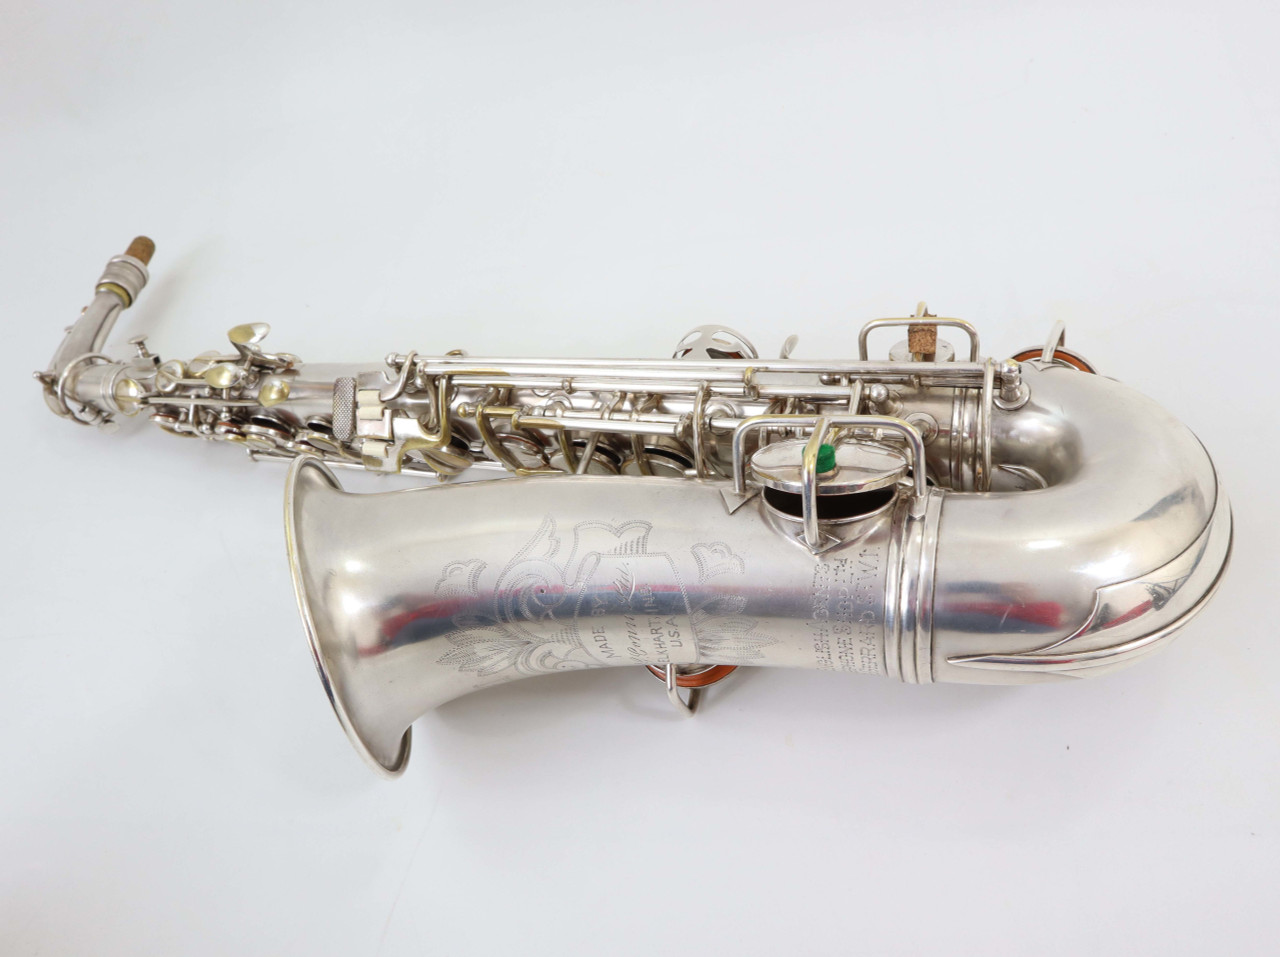 CONN NEW WONDER II ALTO SAX c.1925 SILVER PLATE - REFURBISHED7